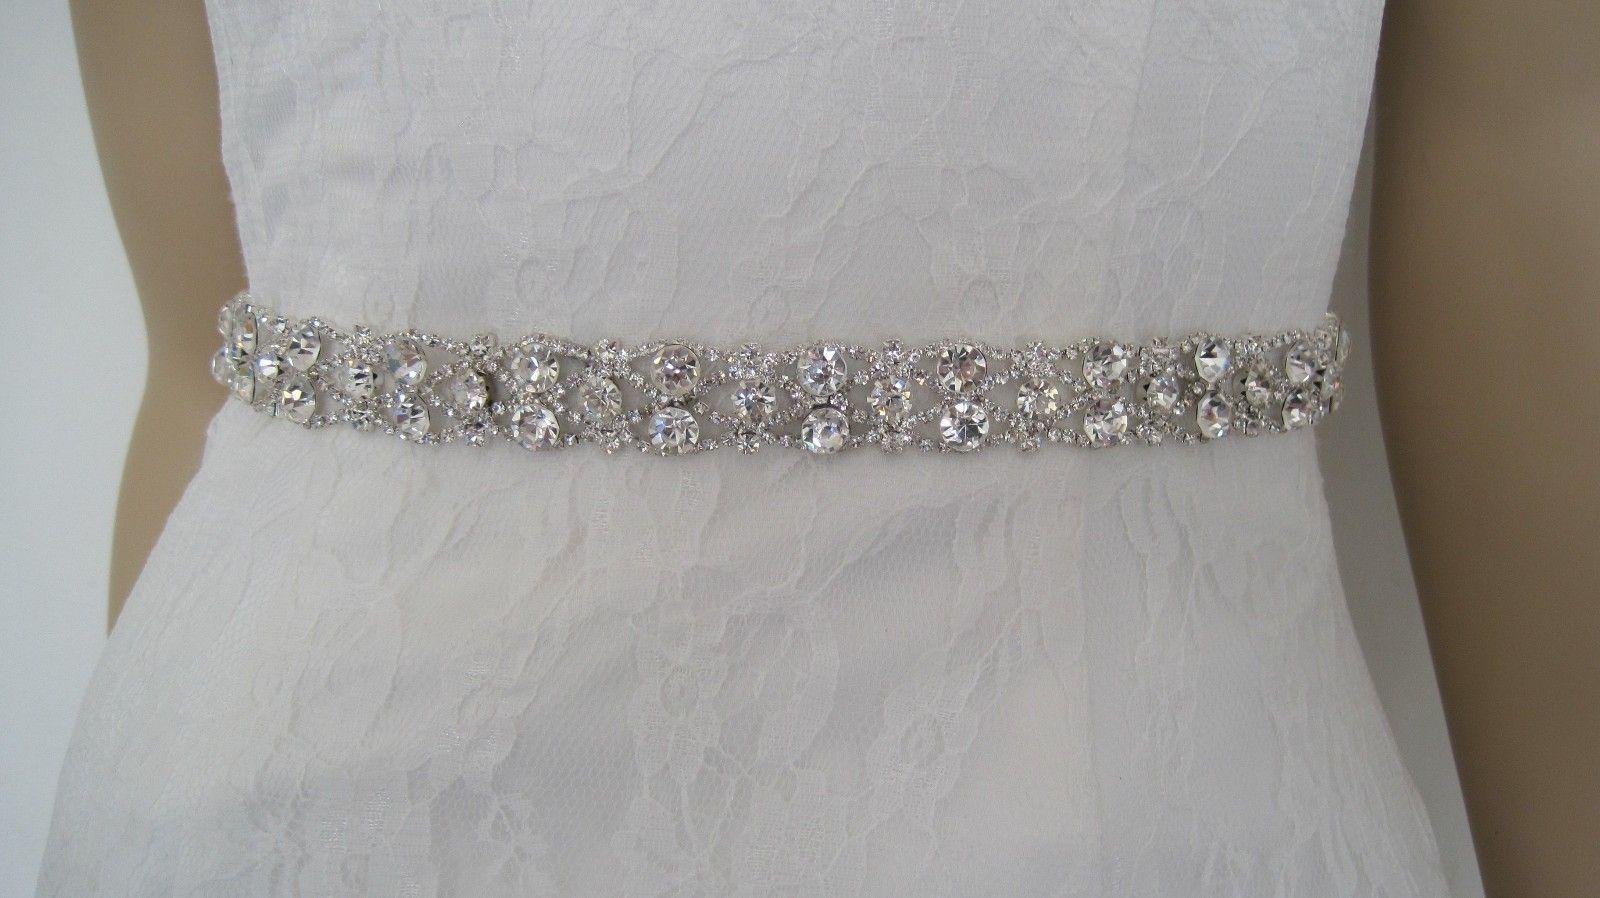 Rhinestone wedding dresses  wedding gown sashes and belts    Wedding Ideas  Pinterest